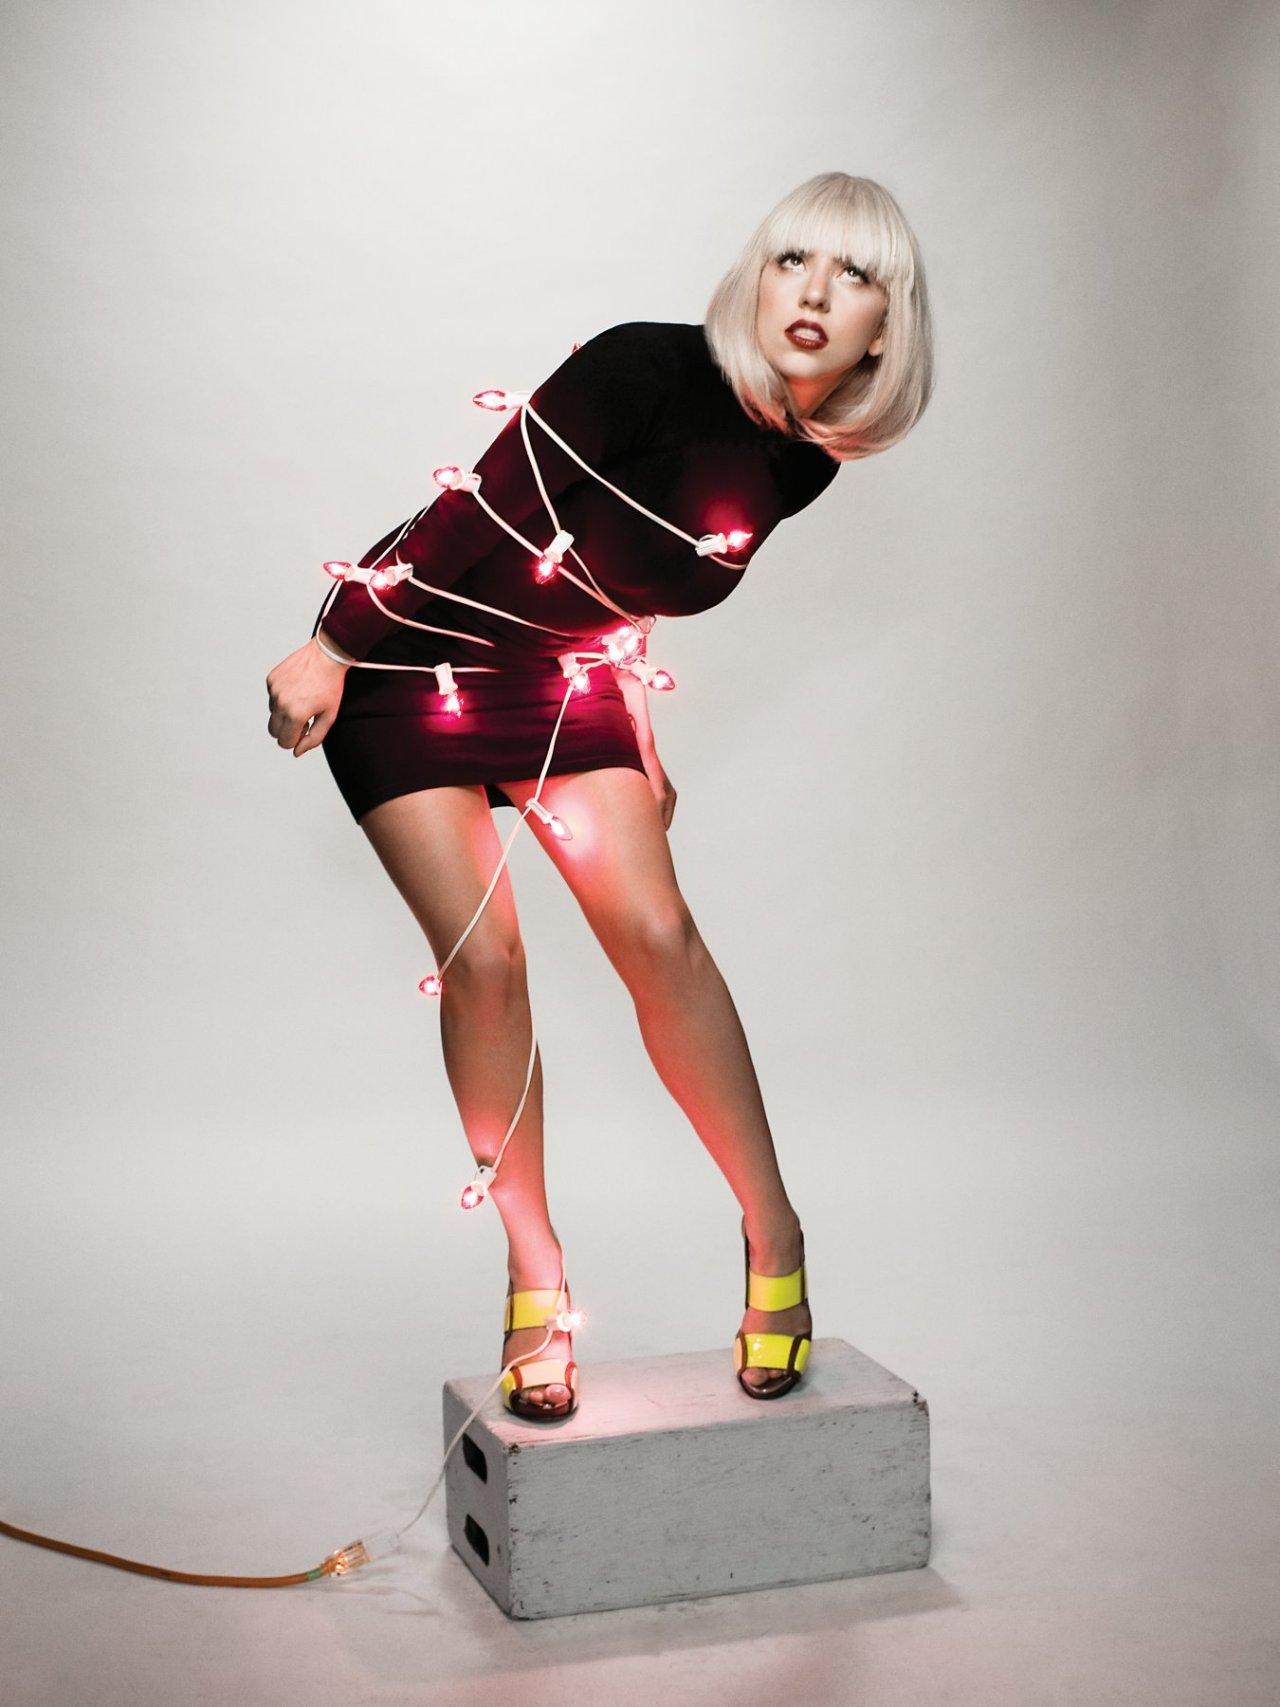 Леди Гага (Lady Gaga) – Стефани Джоан Джерманотта (Stefani Joanne Germanotta)